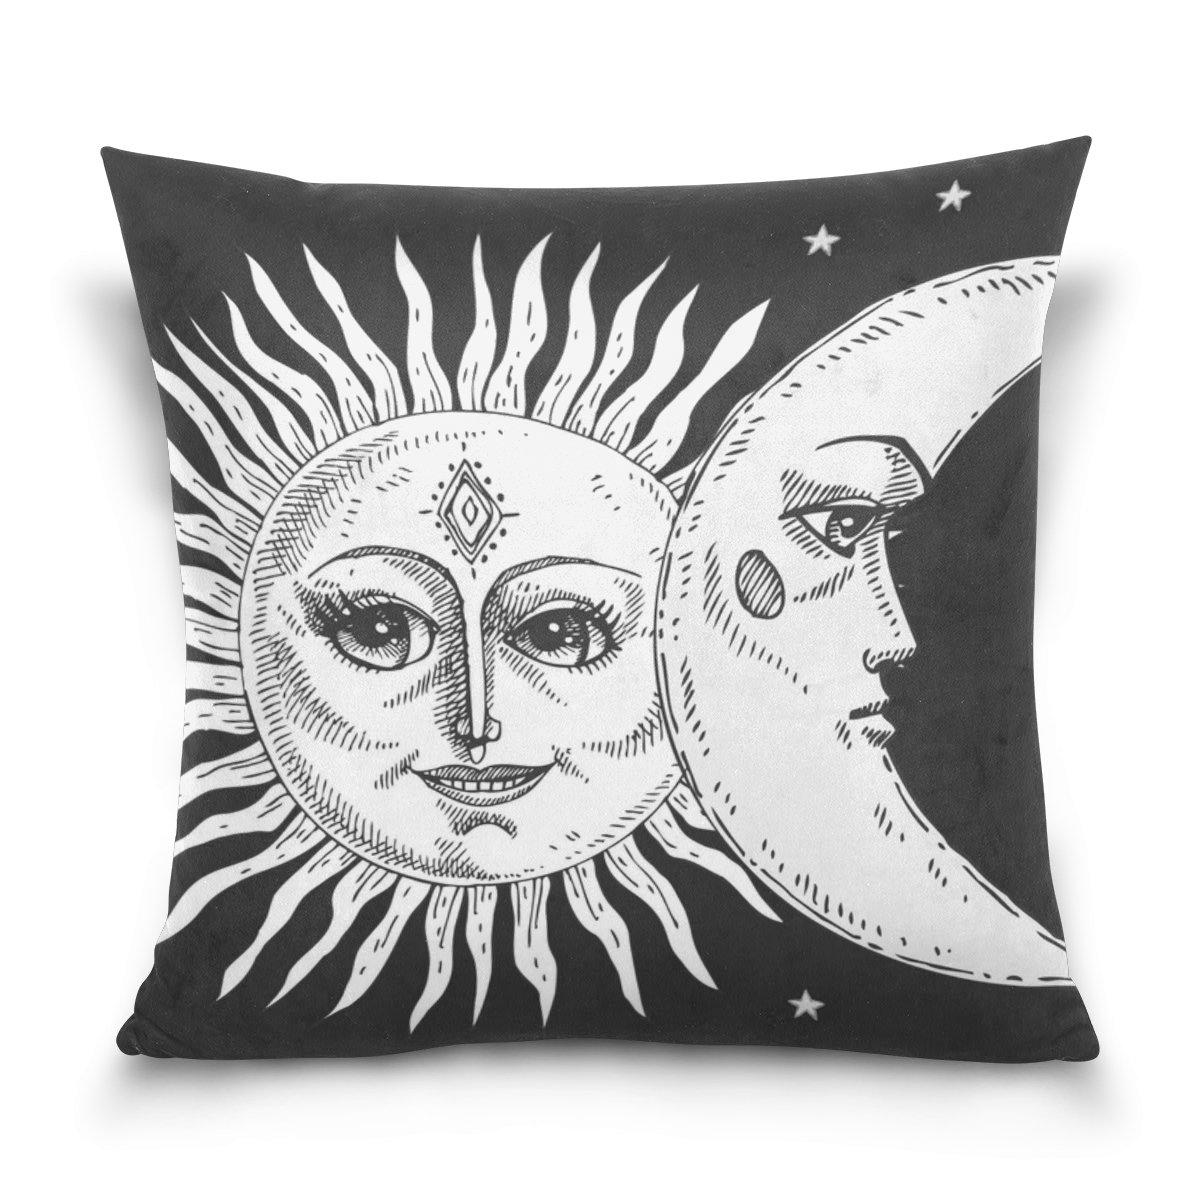 Amazon.com: La Random Throw Pillow Covers Moon Sun Face Soft ...